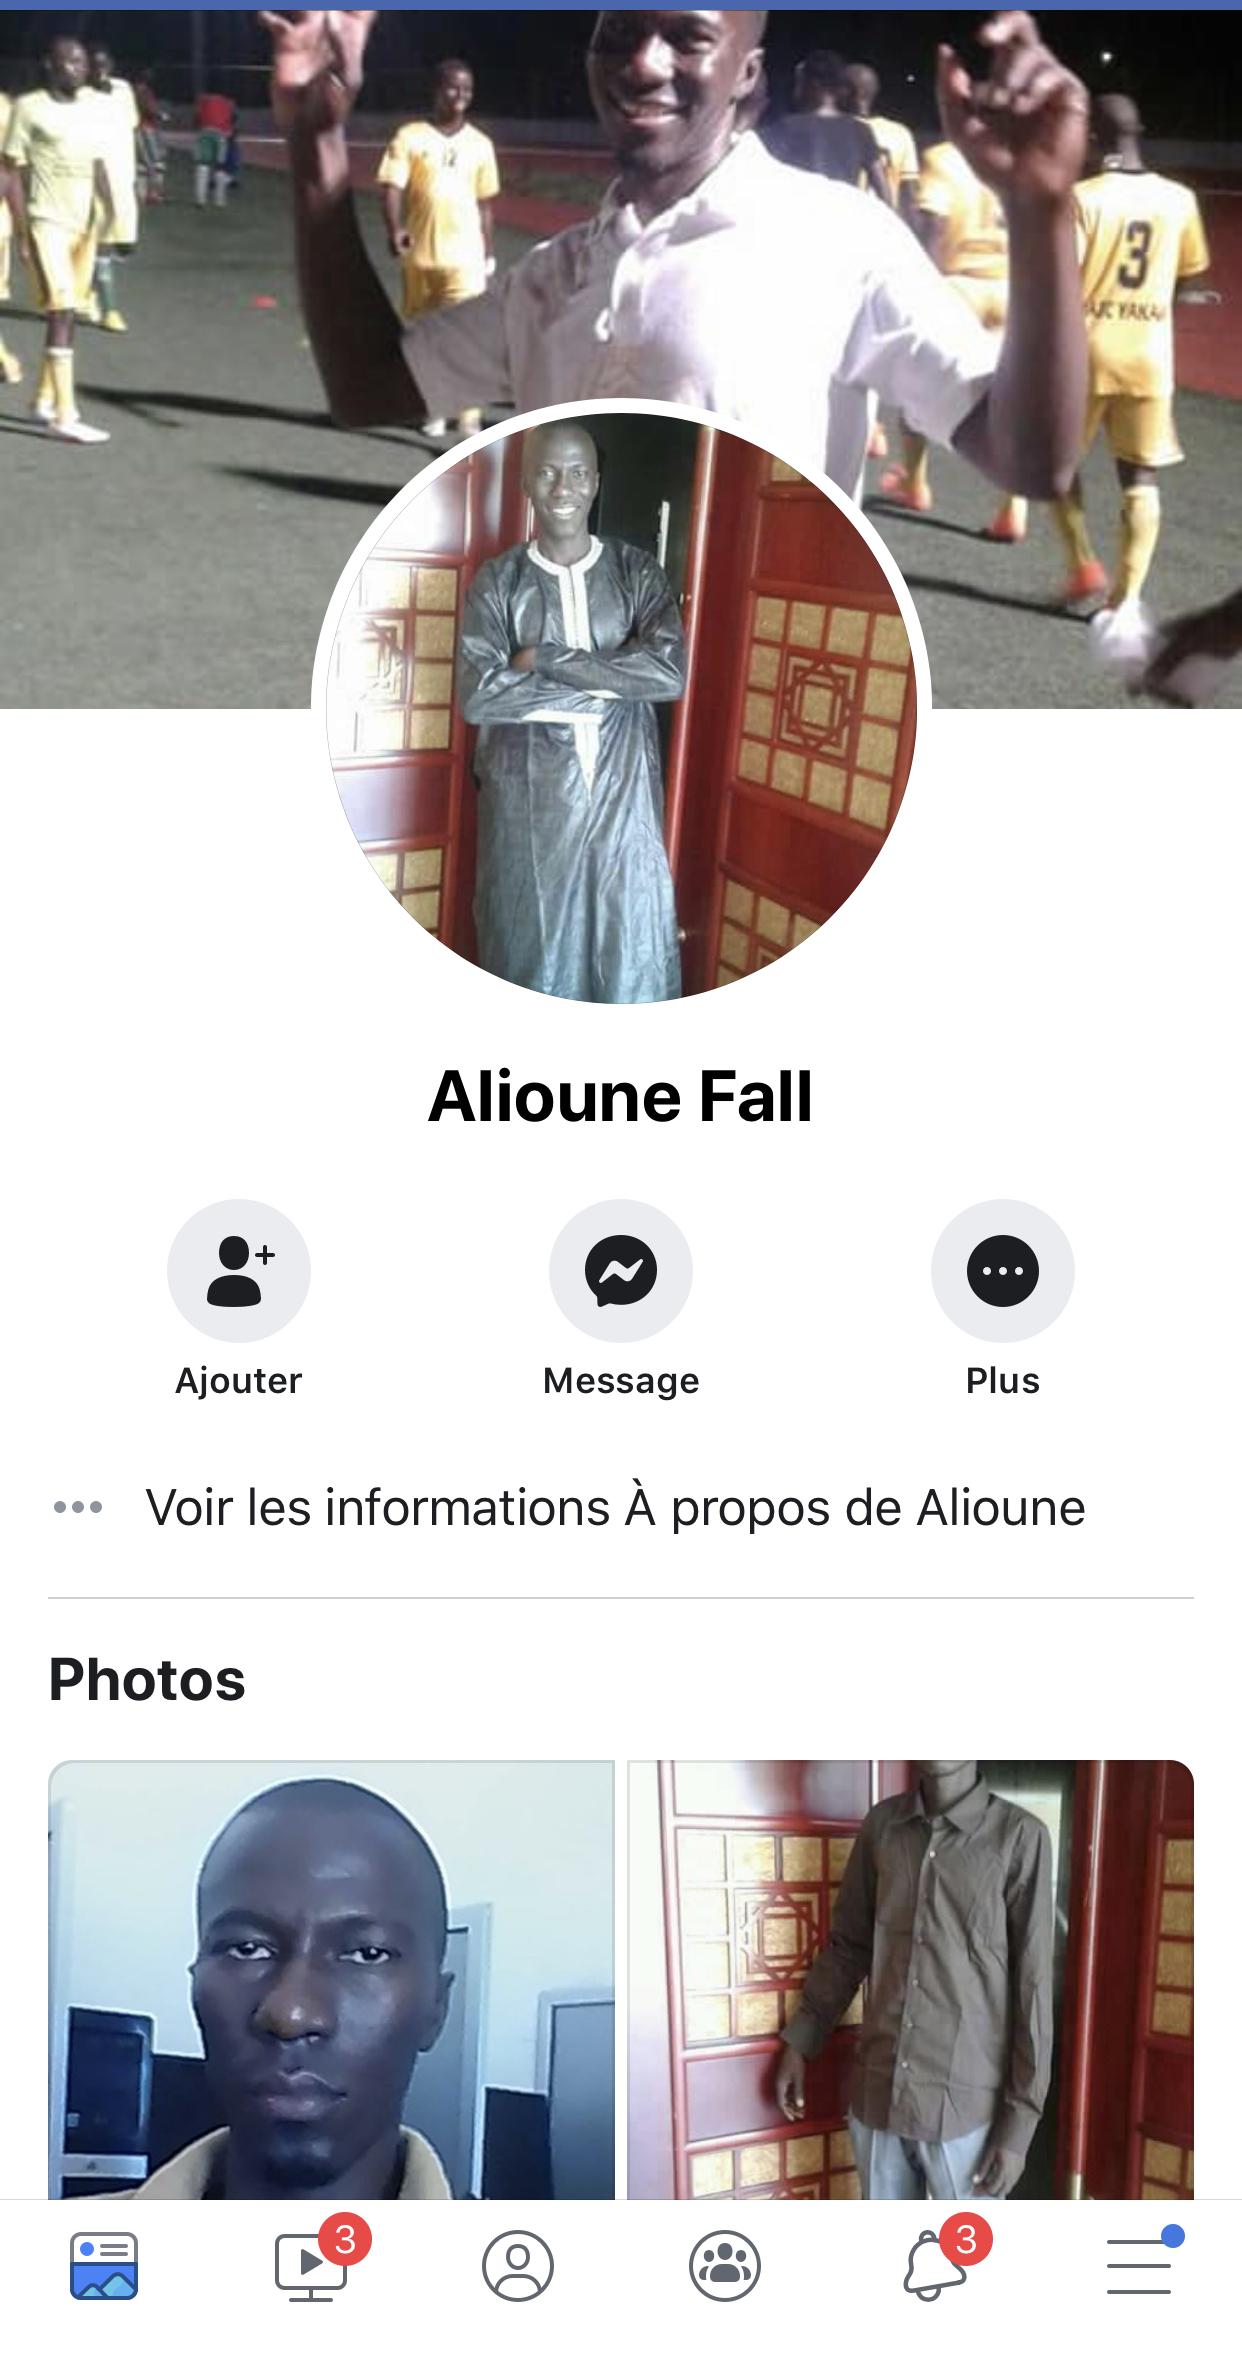 Identification de Pape Alioune Fall : Facebook mis à profit dans l'affaire du meurtre de Bineta Camara